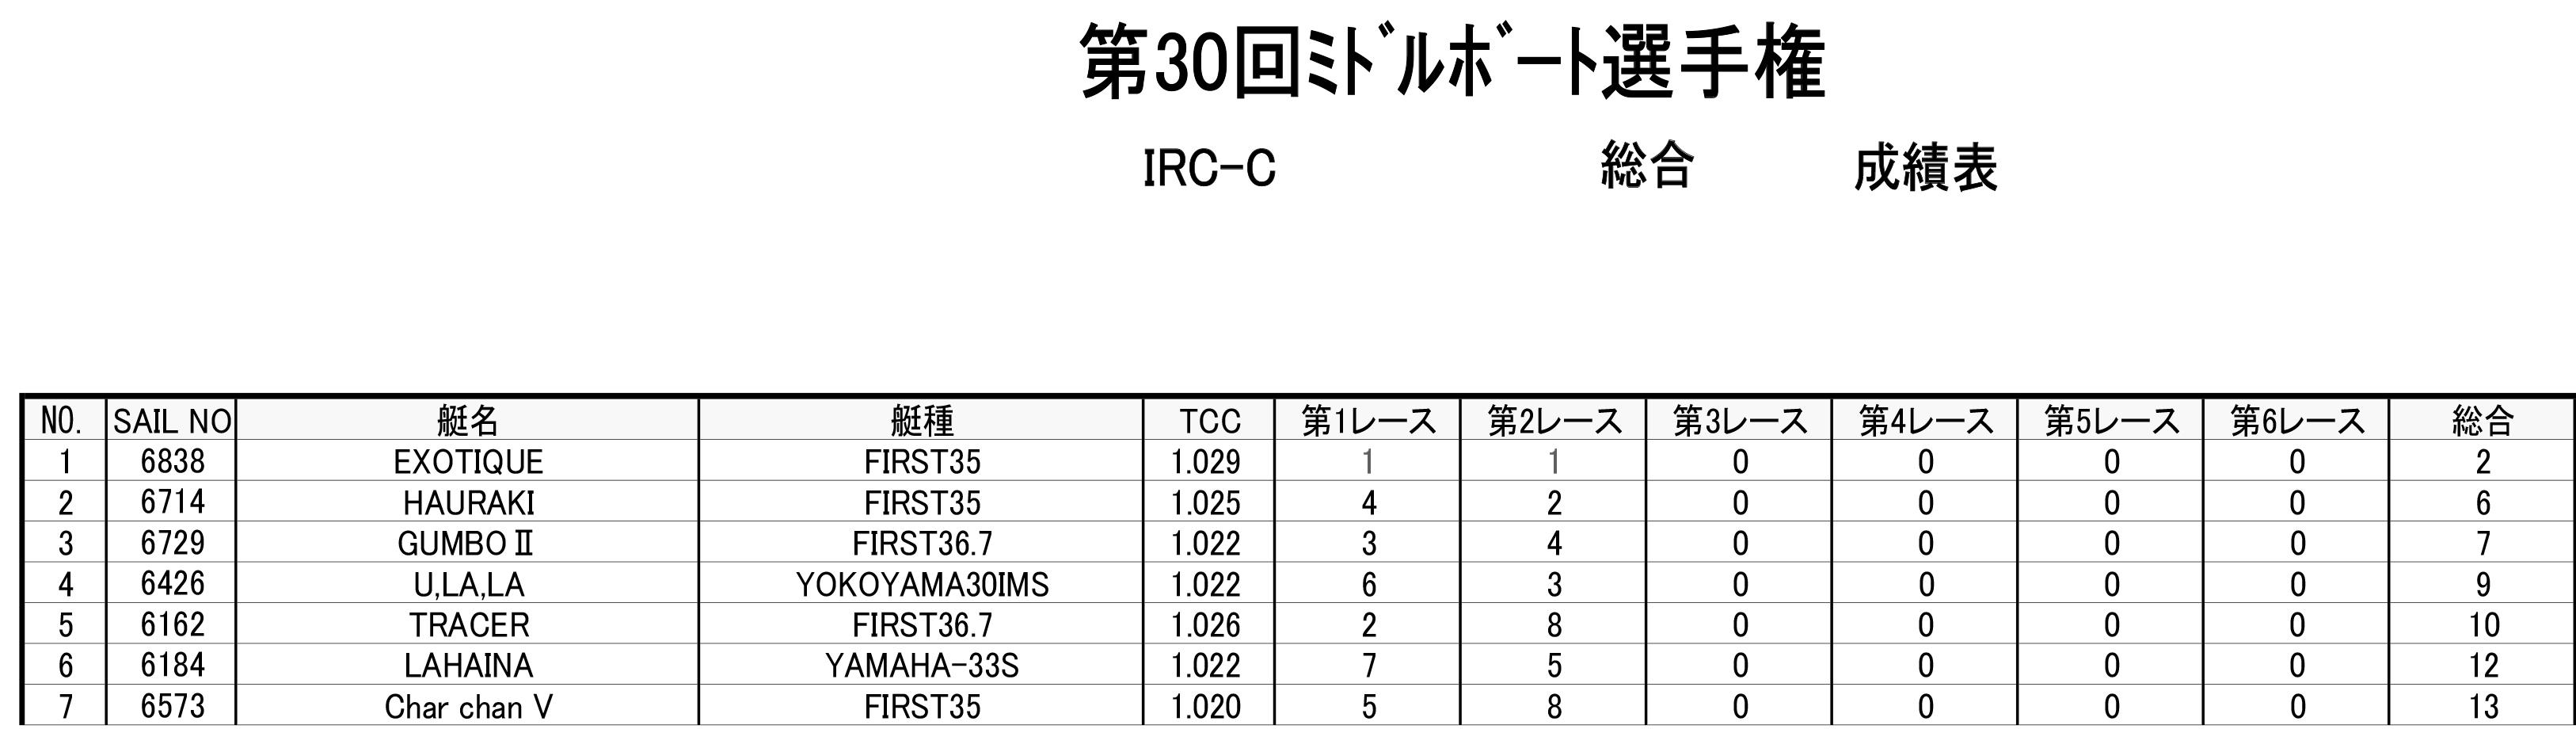 2018-05-06_ircc